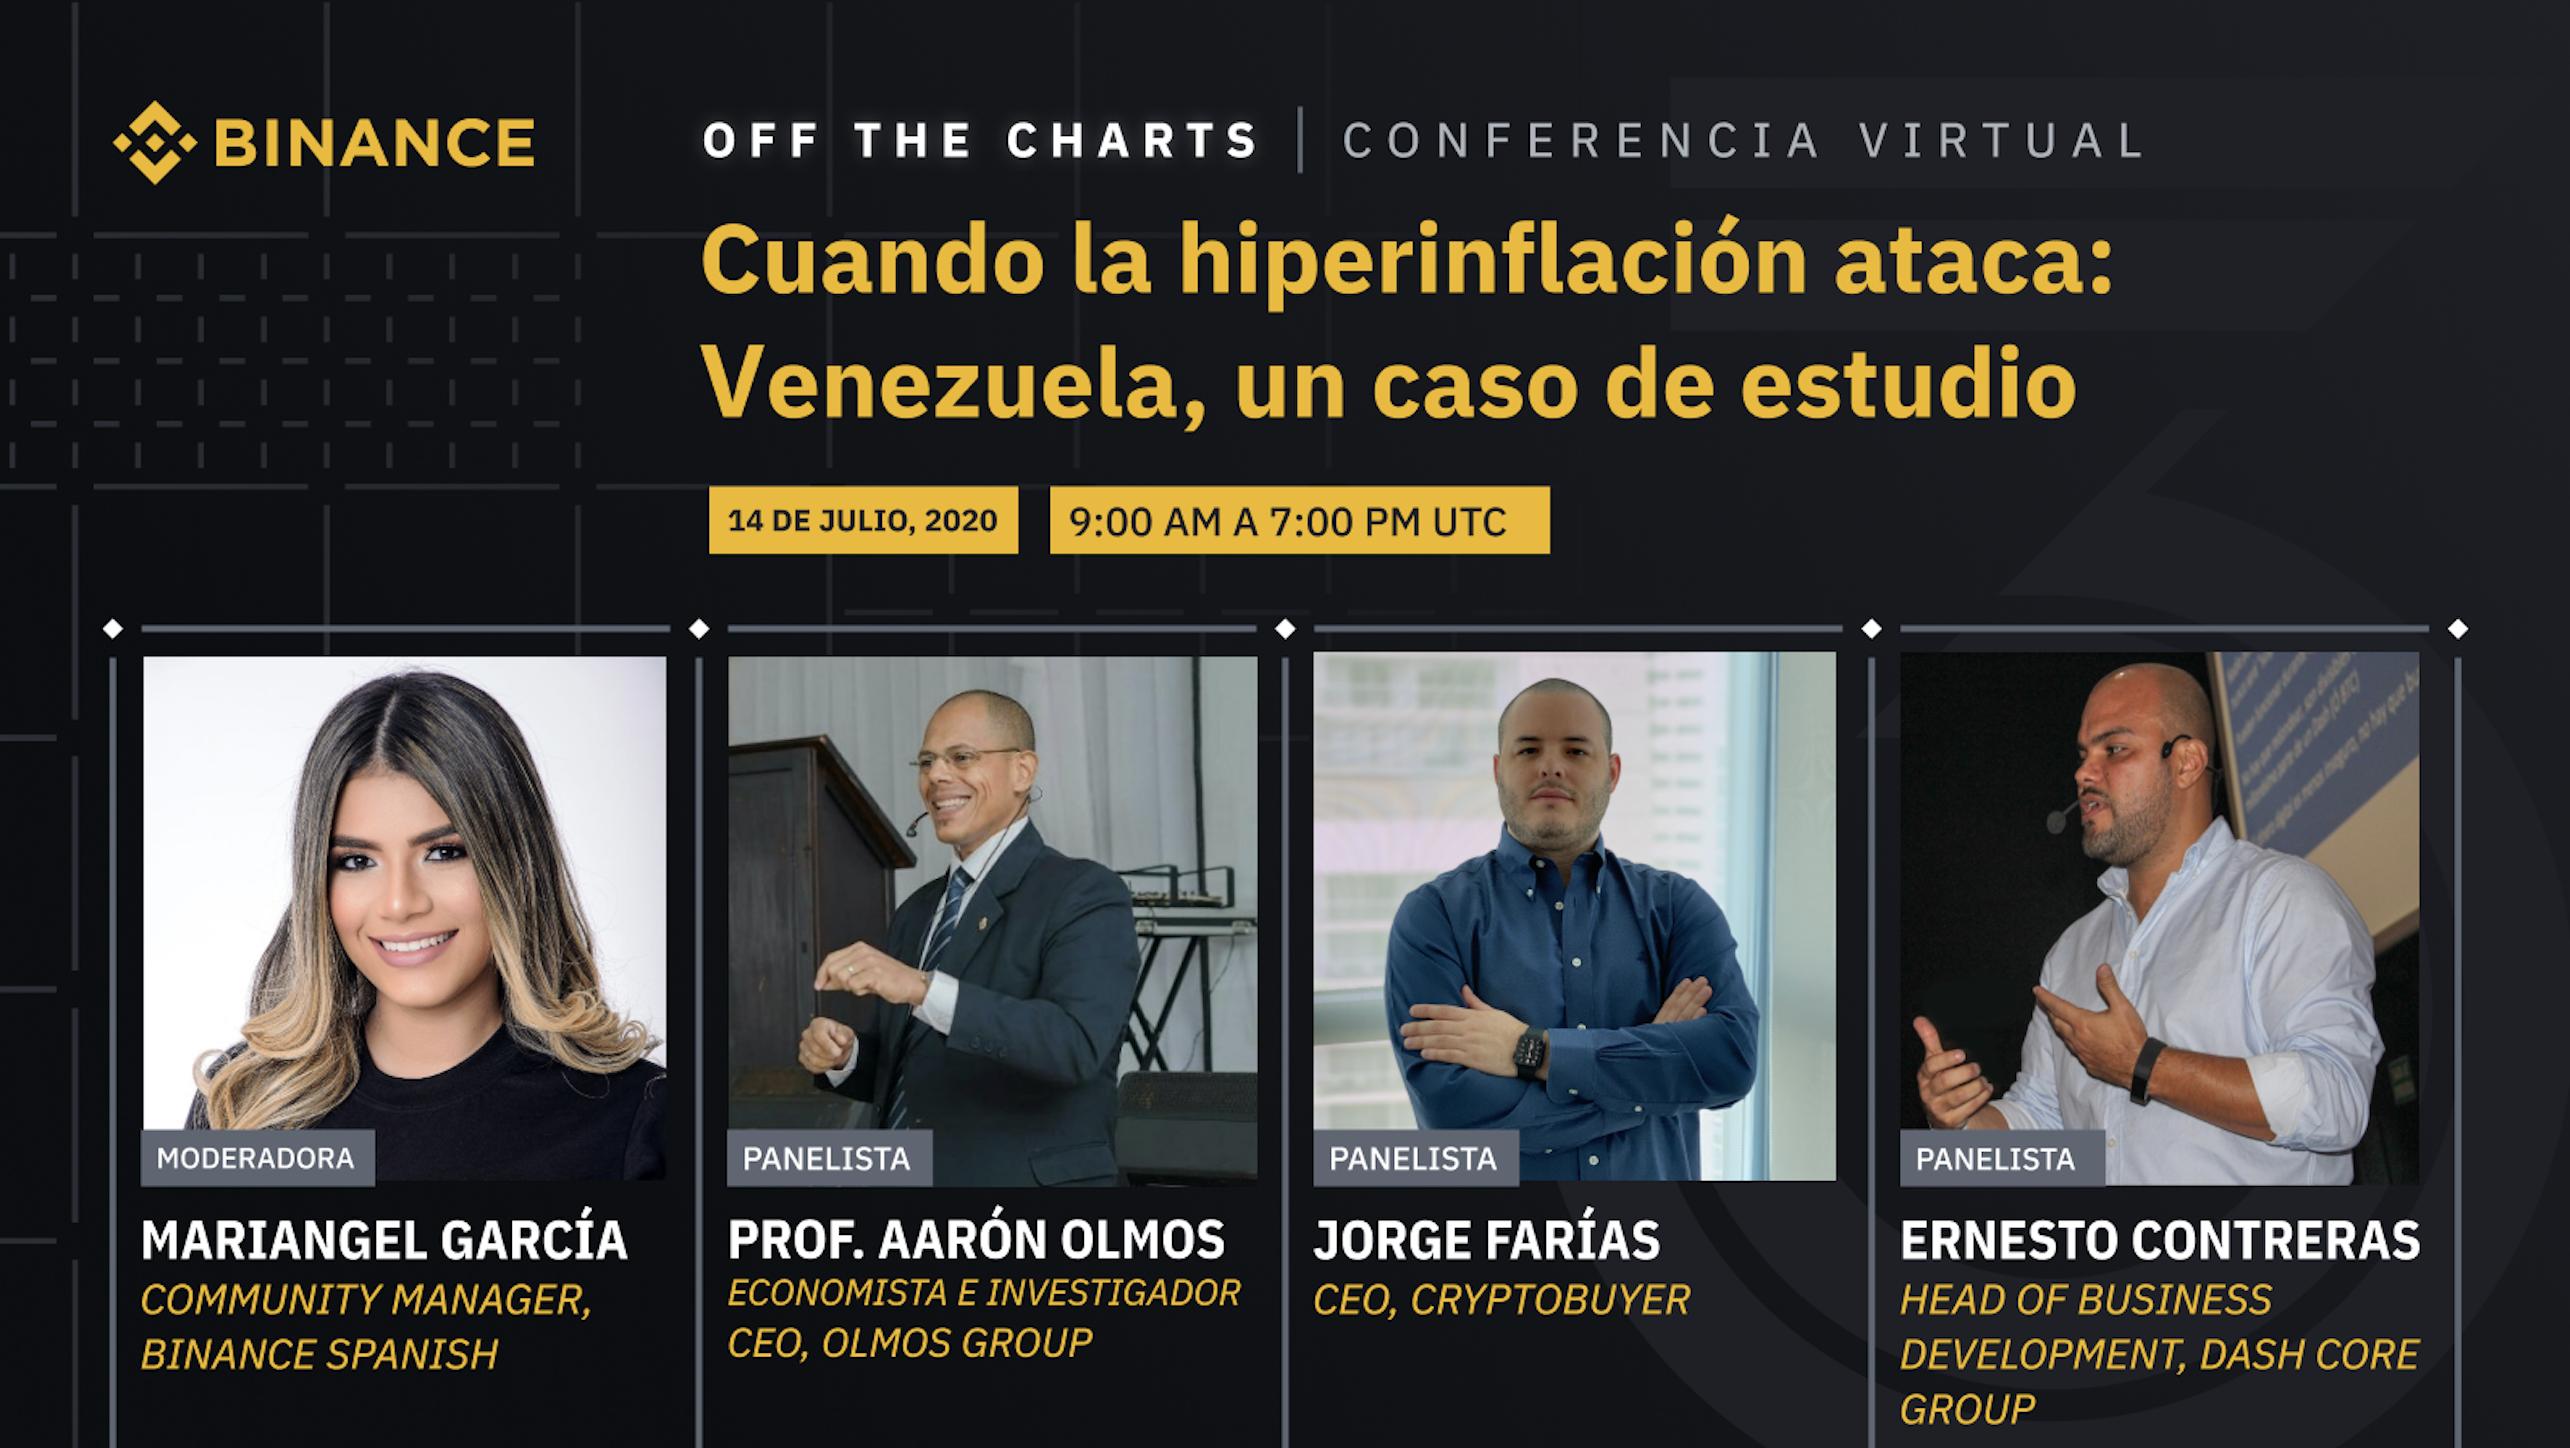 binance off the charts venezuela criptotendencias.com